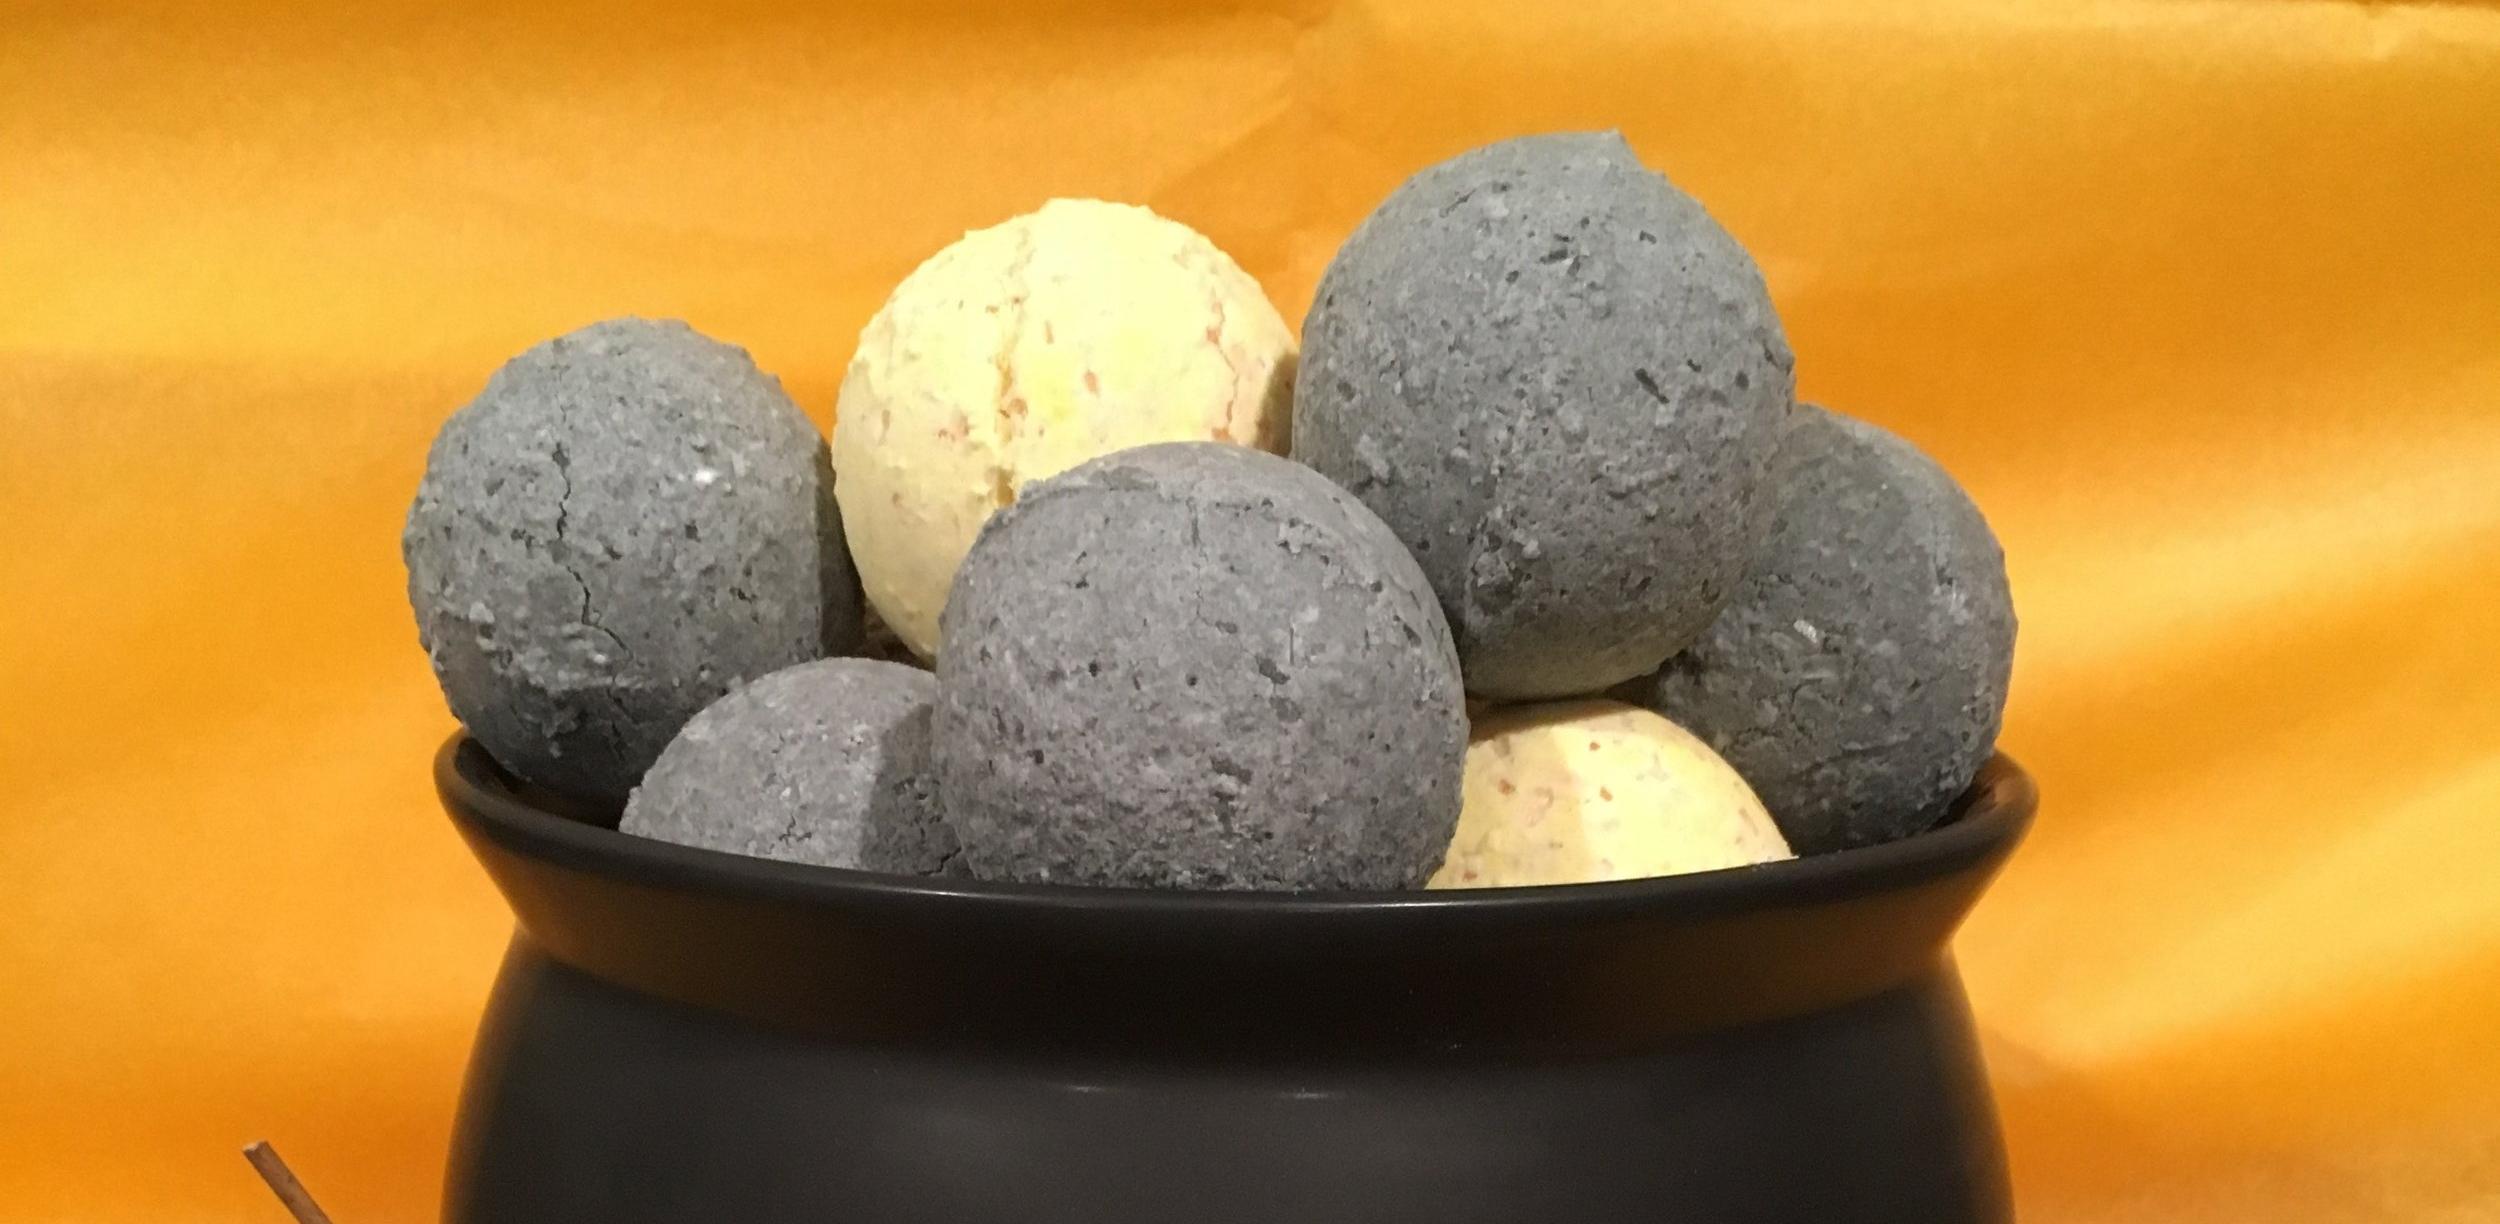 Halloween Mini Bombs Are Here!  Buy Now